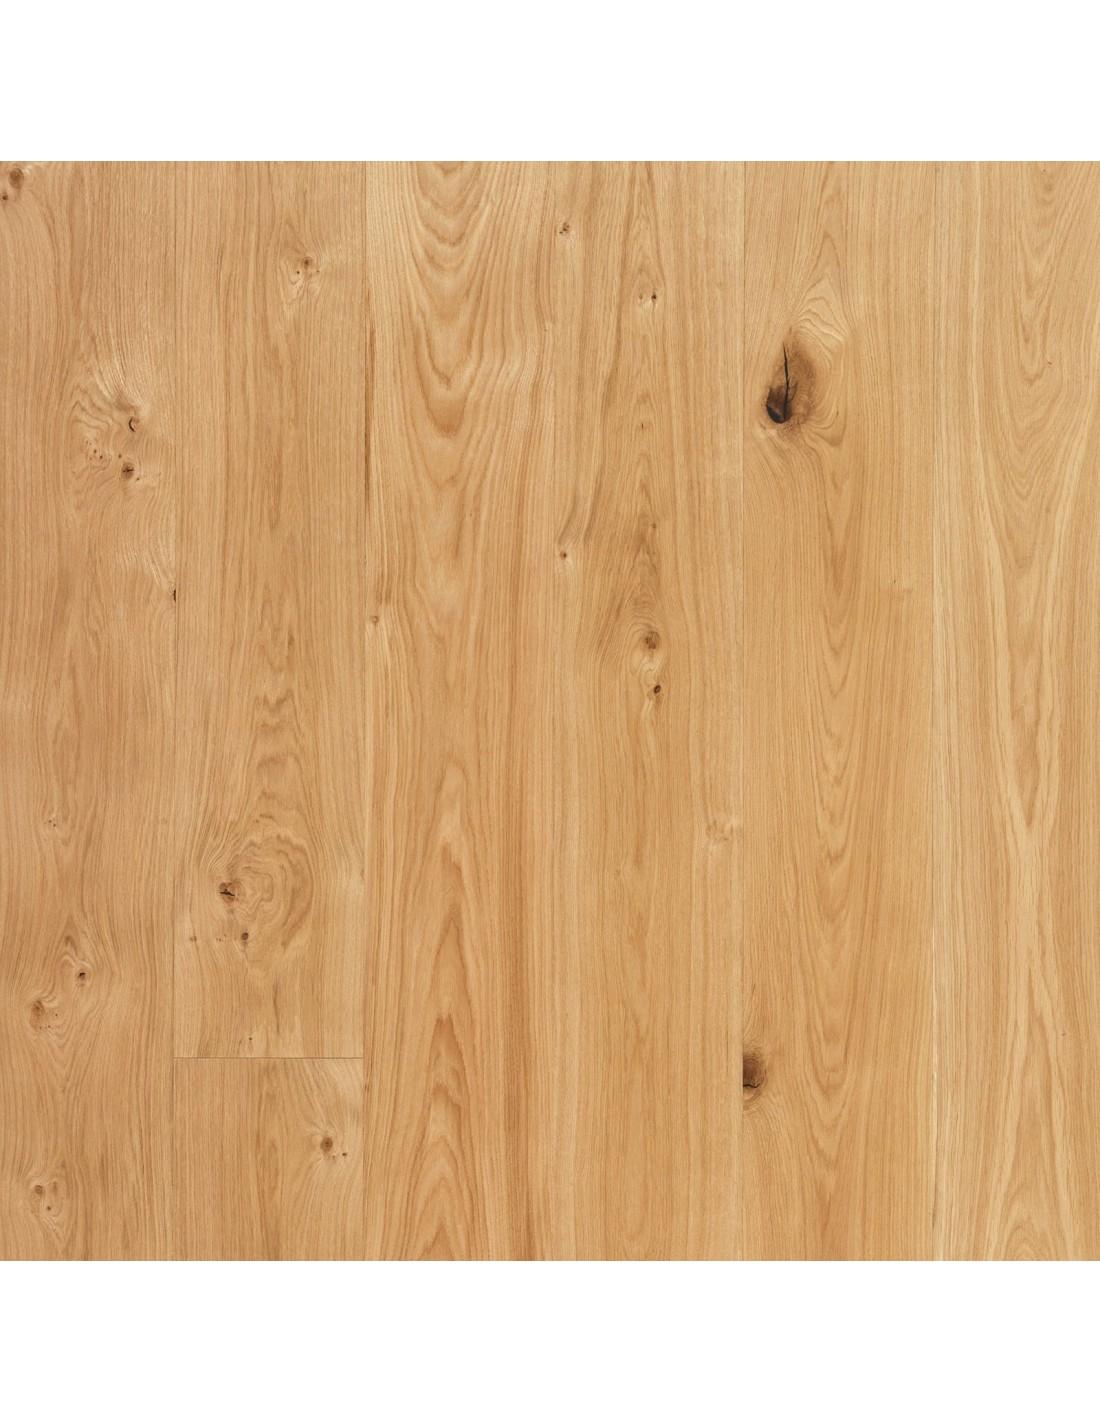 sol stratifi effet parquet ch ne millenium brun sols stratifi s. Black Bedroom Furniture Sets. Home Design Ideas